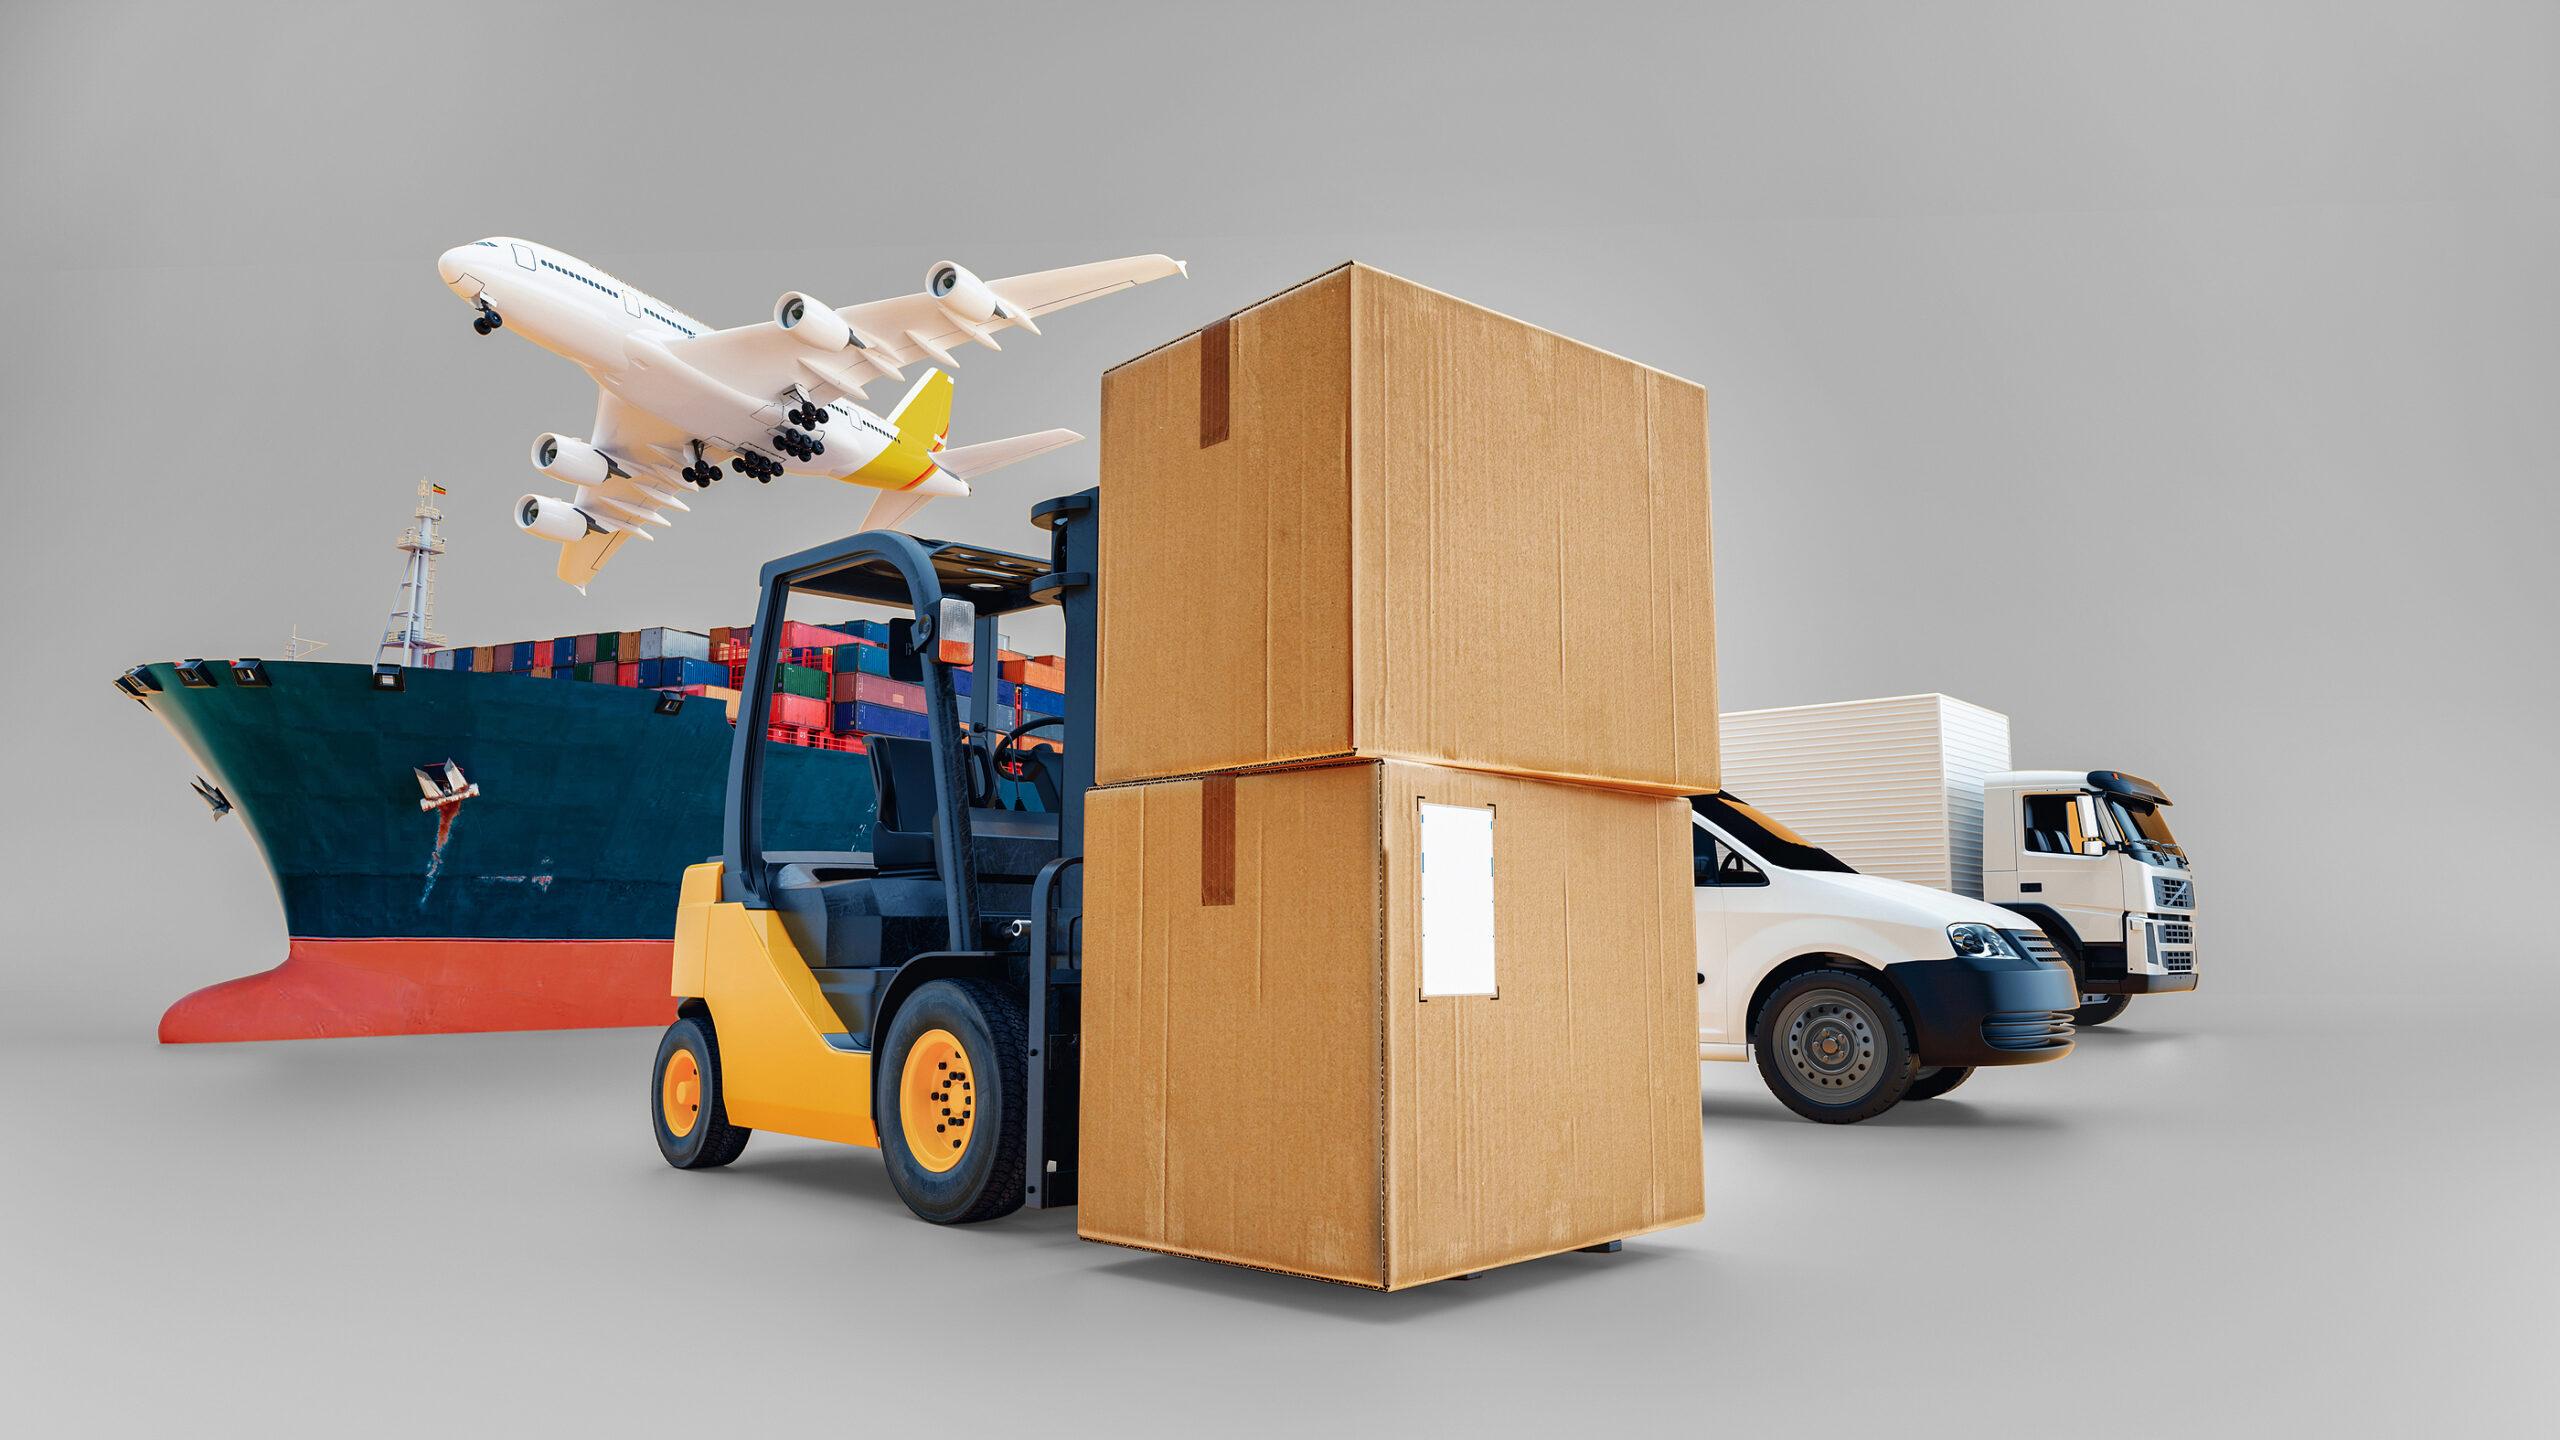 Logistics via airplane, truck and ocean cargo.